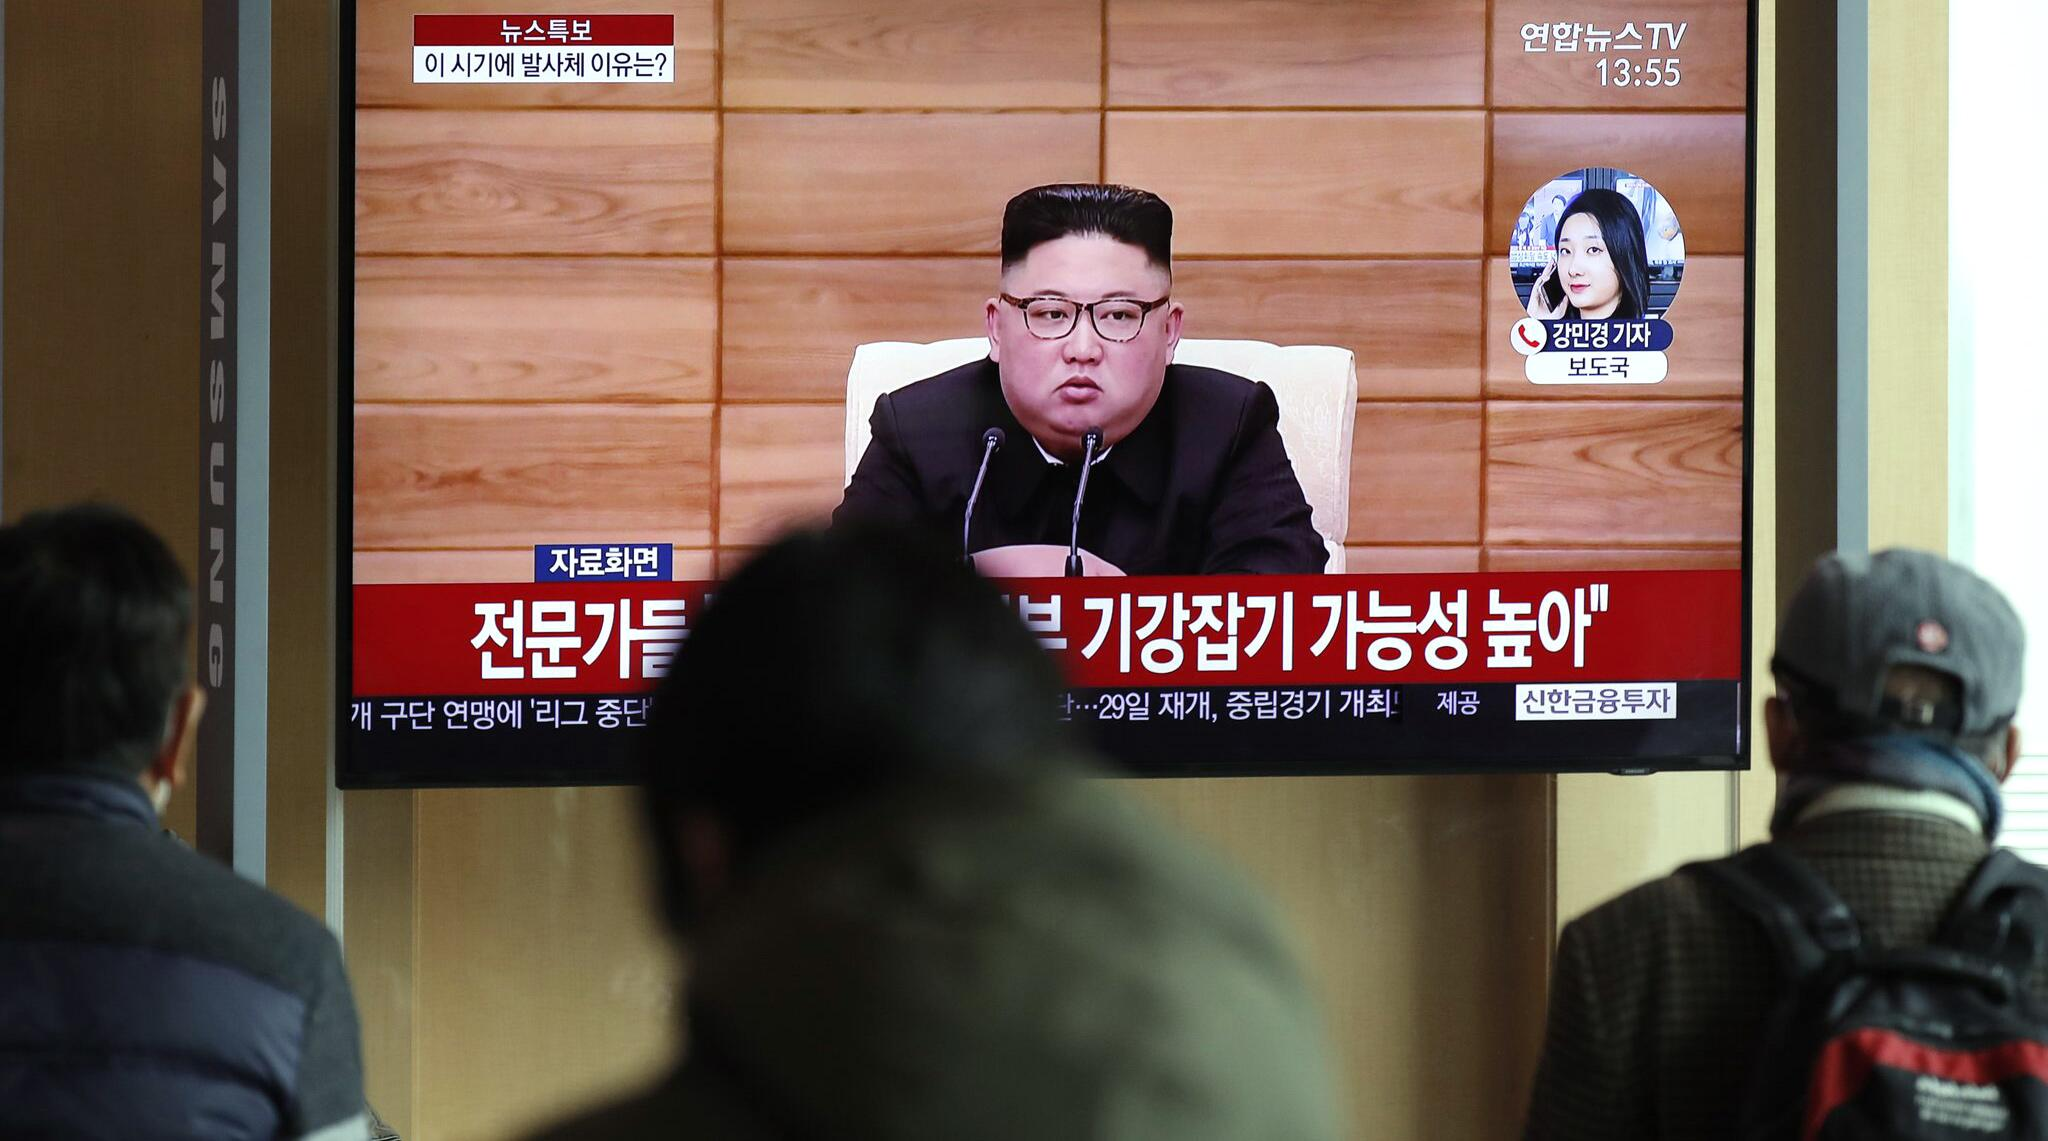 Bild zu Nordkorea unternimmt neue Waffentests